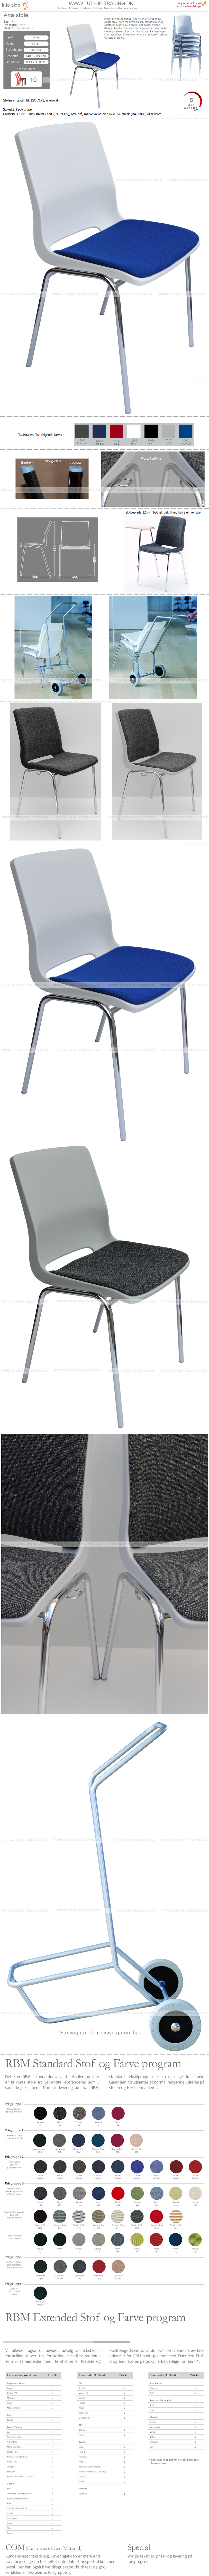 Ana stol med krom stel, hvid plastskal og Oxford stof blå nr. 7. Der er 5 års garanti på Ana stole.